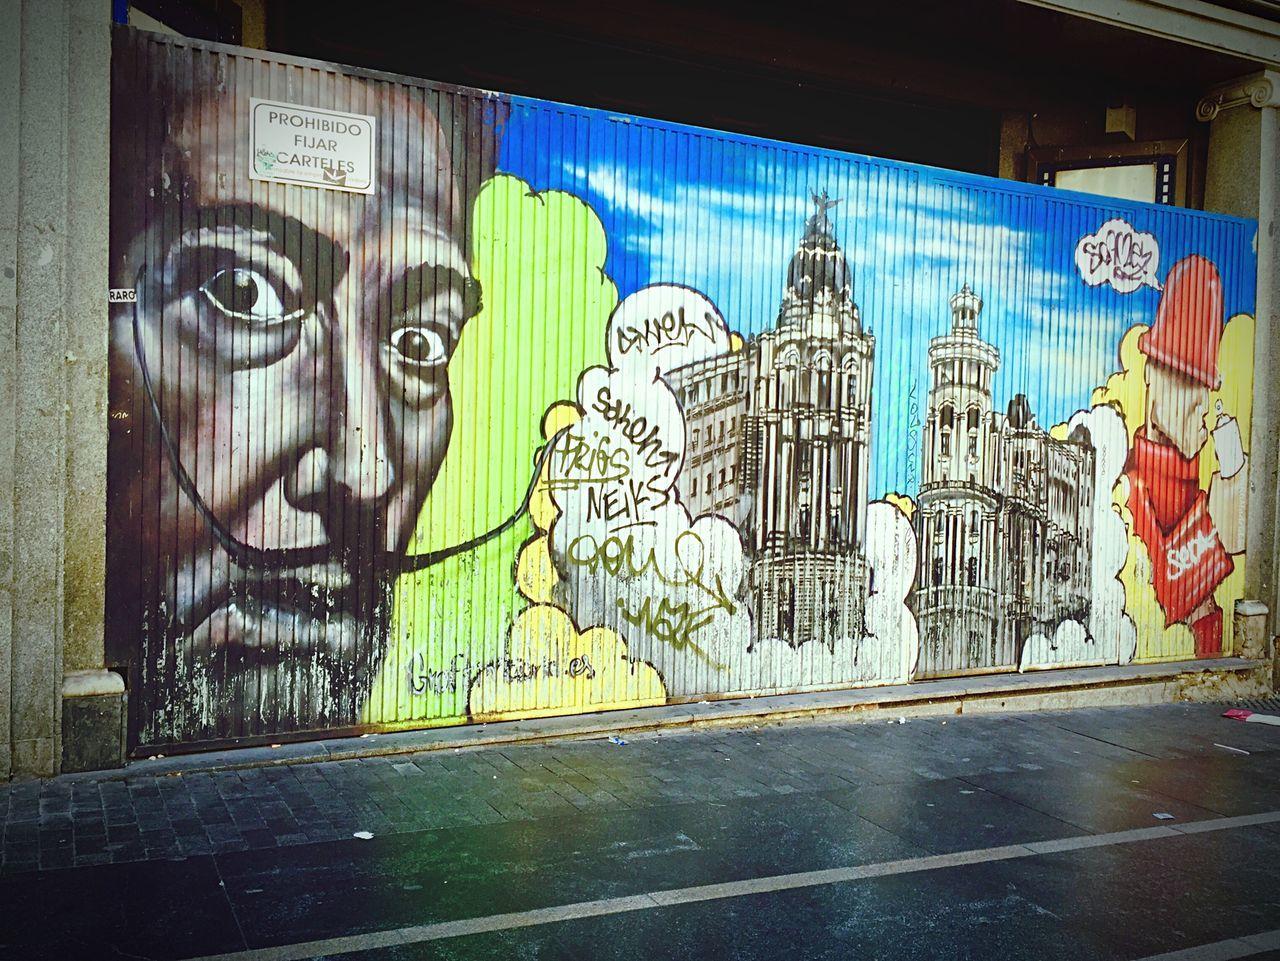 El gran Dalí... Salvadordali Granvia Summer2015 Madrid SPAIN Graffiti Mural Urbanphotography Streetphotography IPhoneography